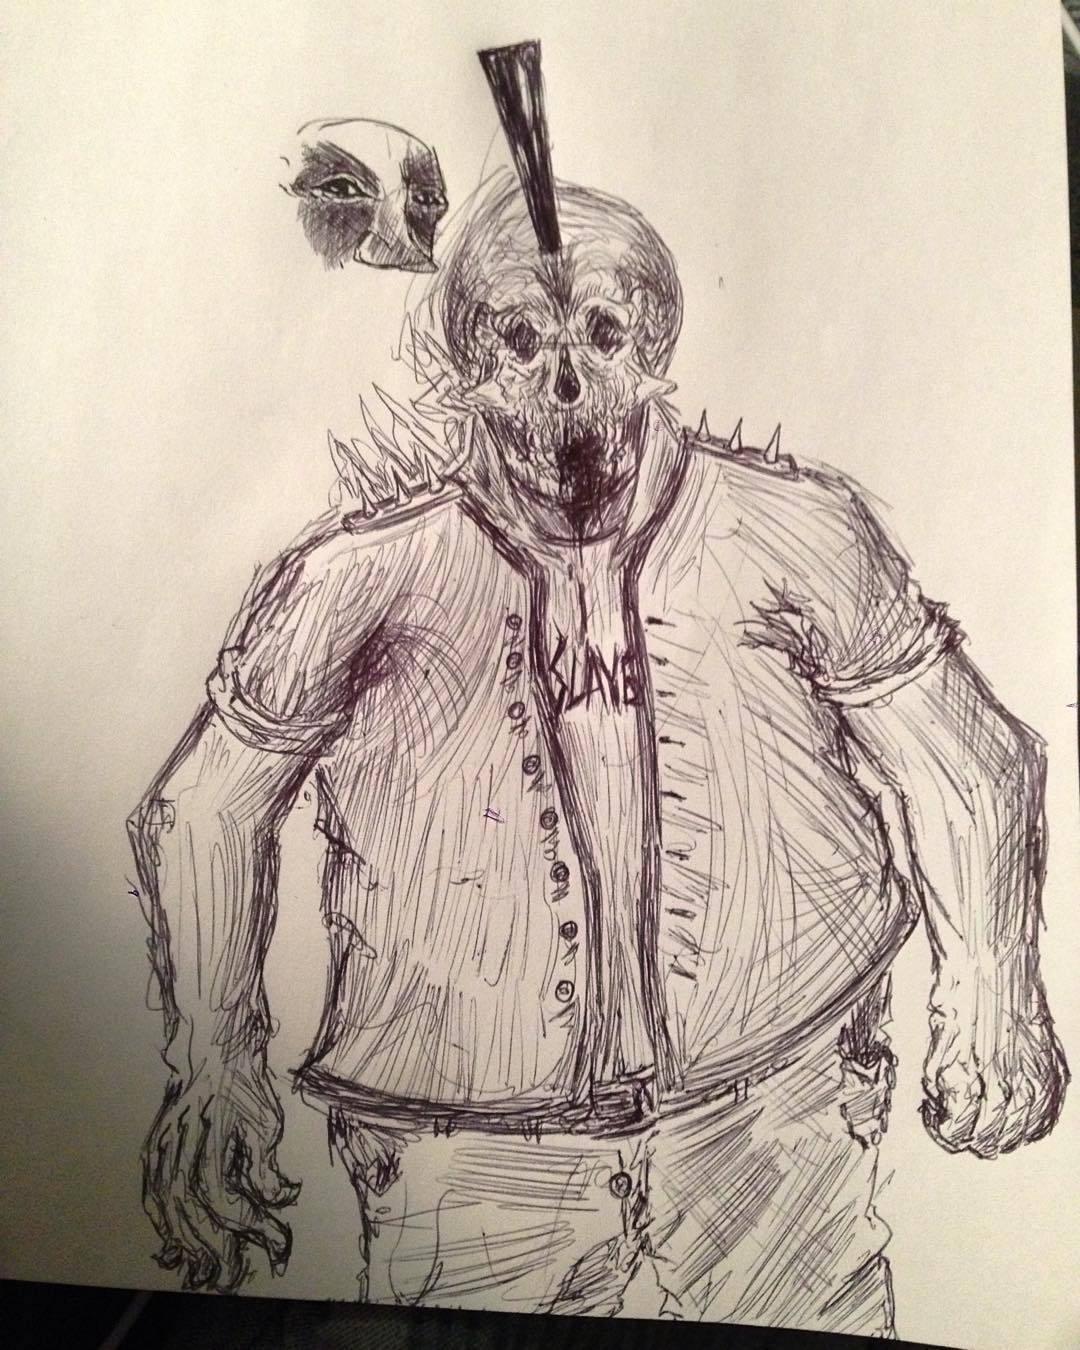 Drawn triipy skeleton More shitty #pen #trippy #weird